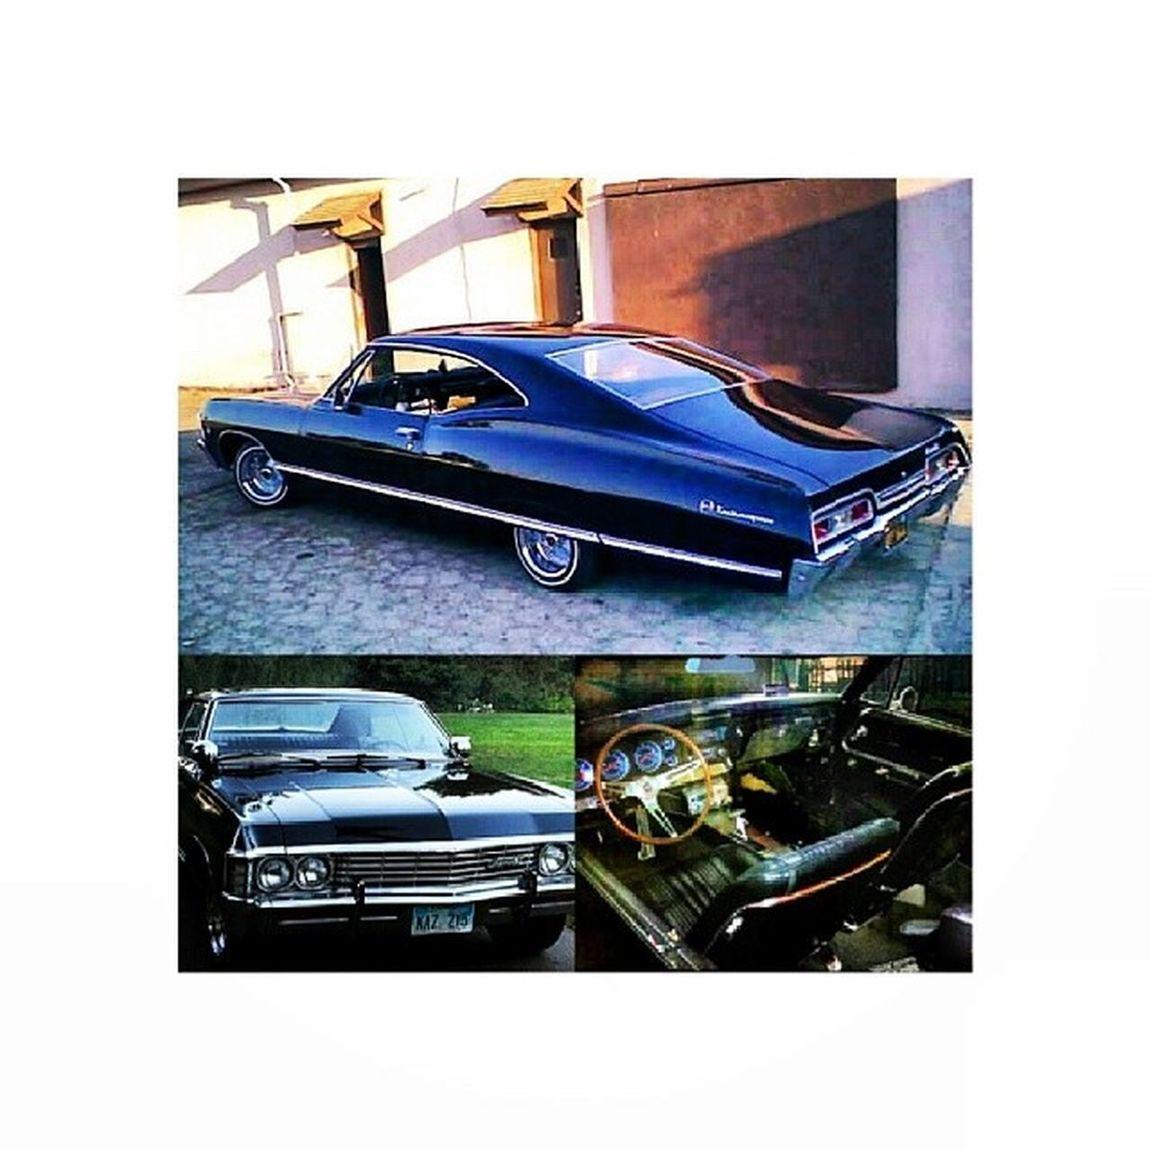 En sevdiğim Chevrolet Impala67